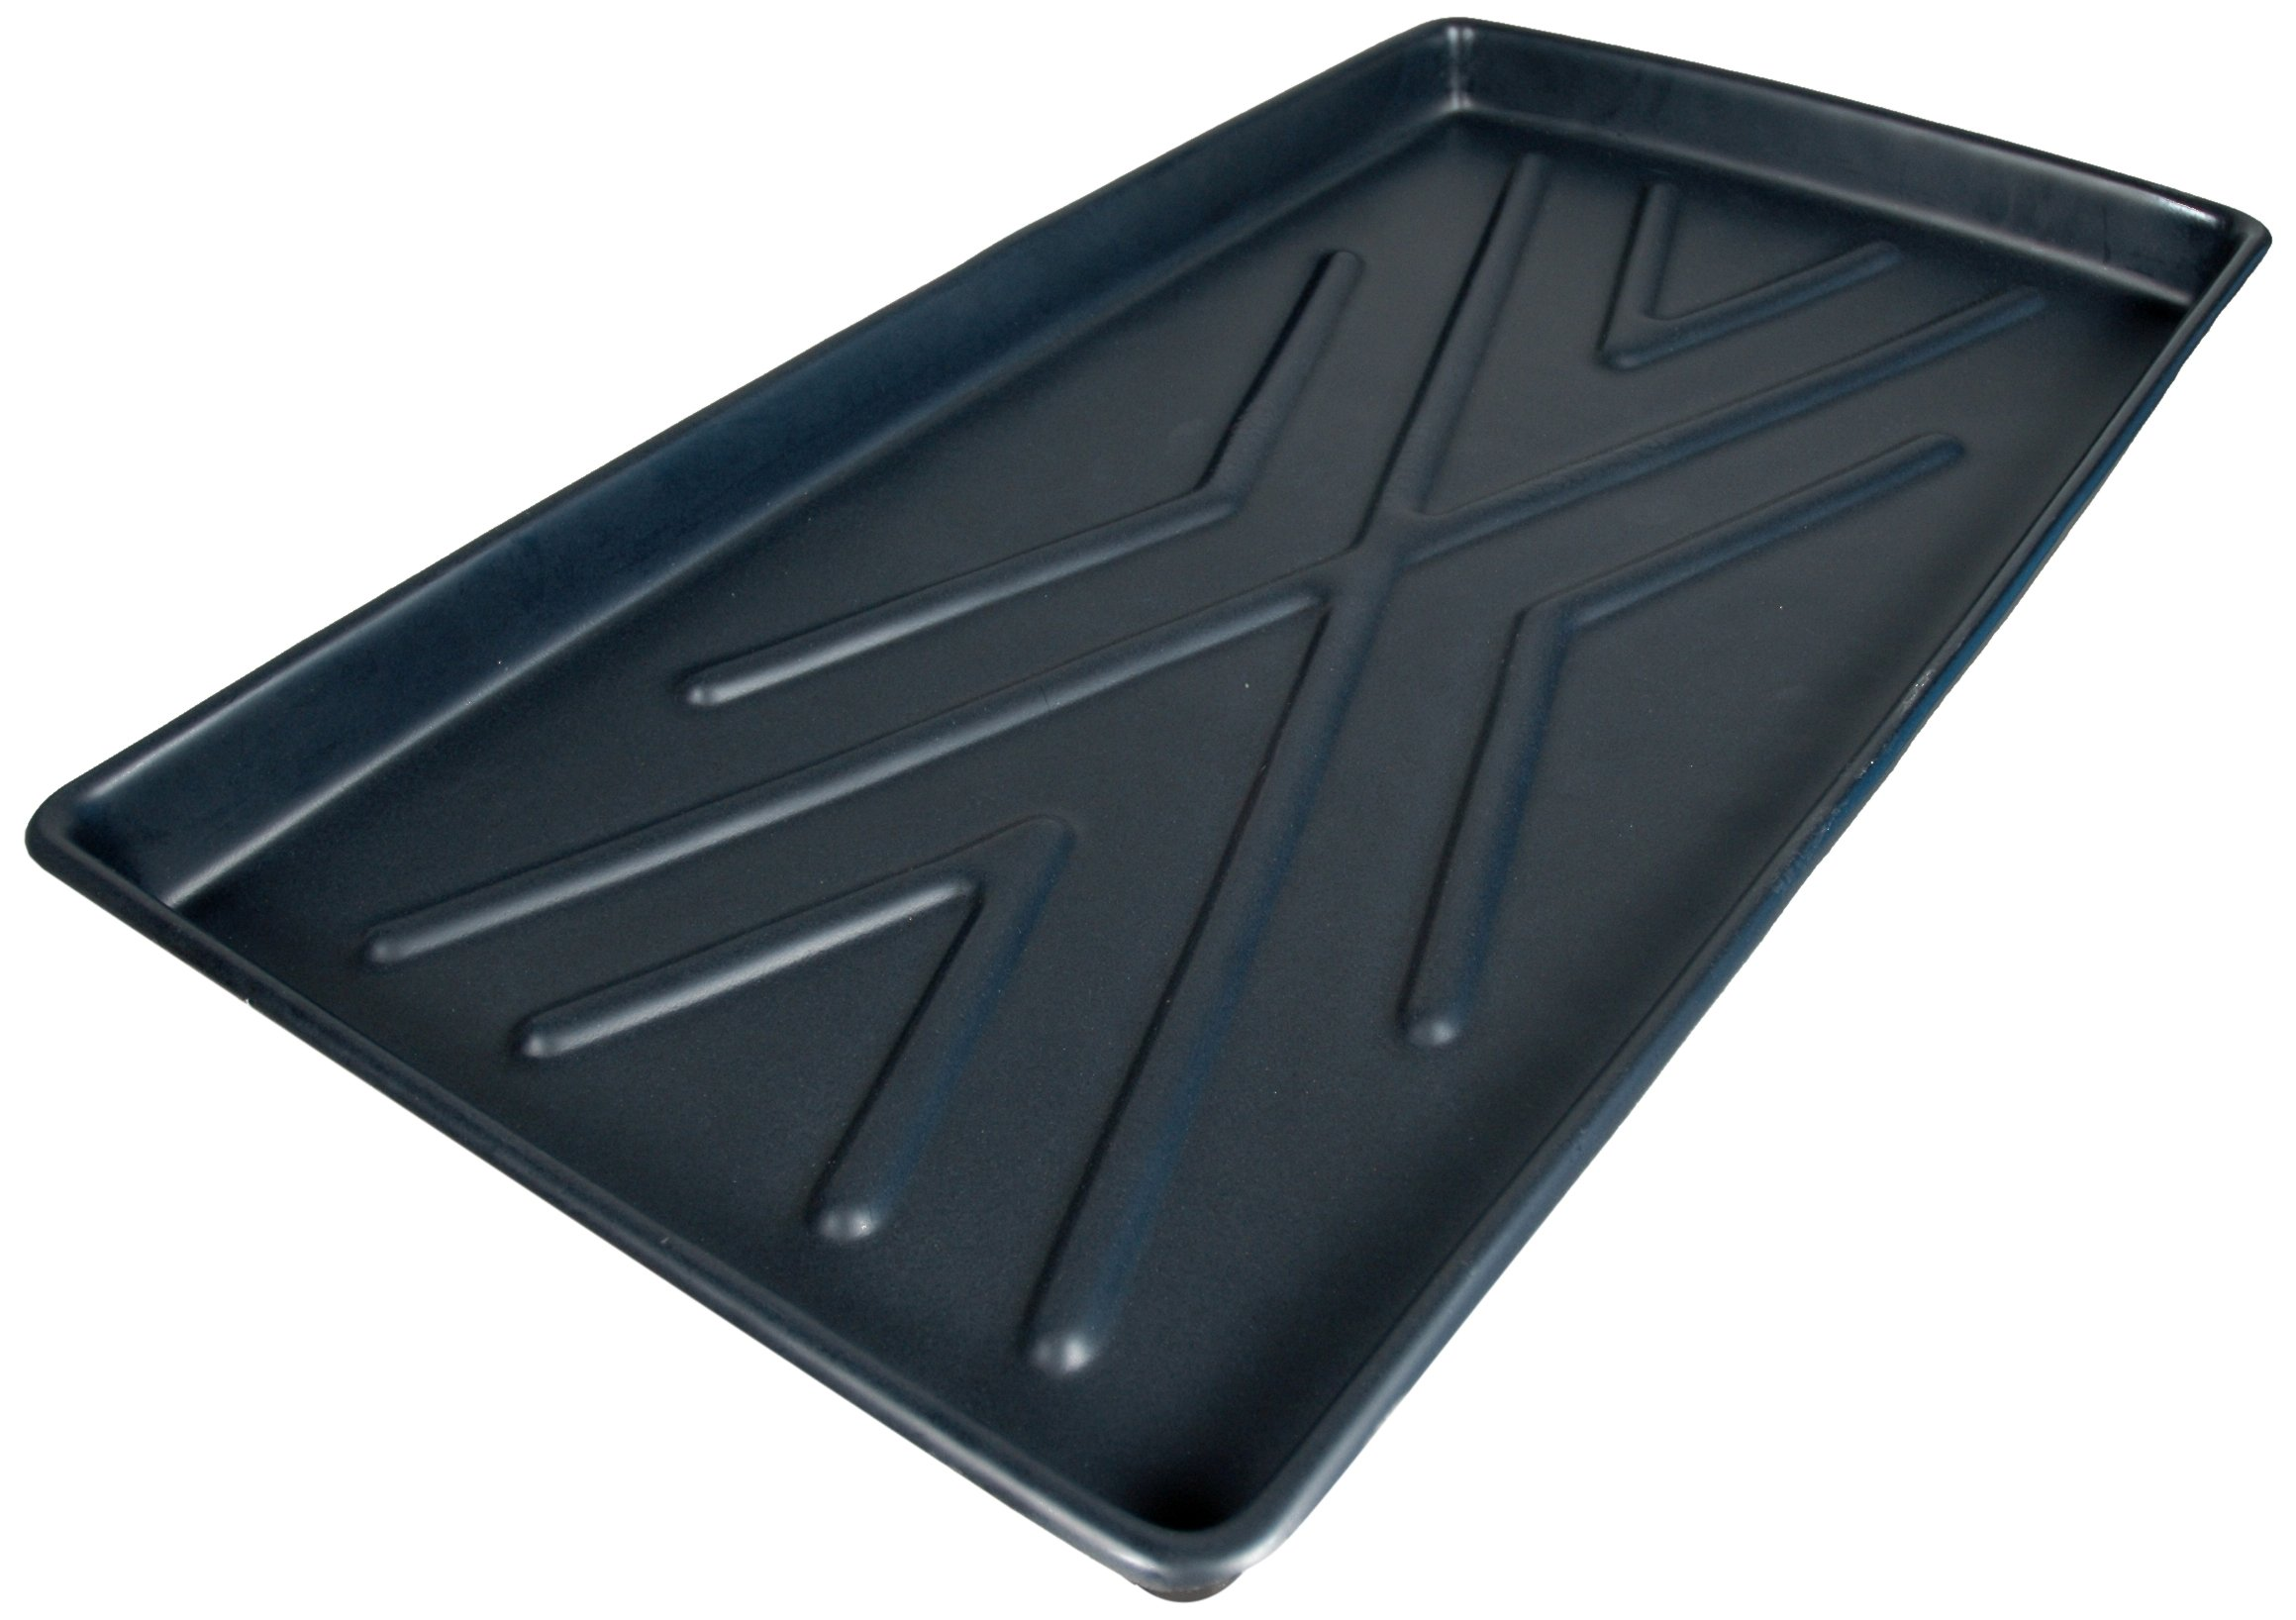 UltraTech 2370 Polyethylene Rack Containment Single Tray, 8 Gallon Capacity, 44'' Length x 23-1/2'' Width x 2-3/4'' Height, Black